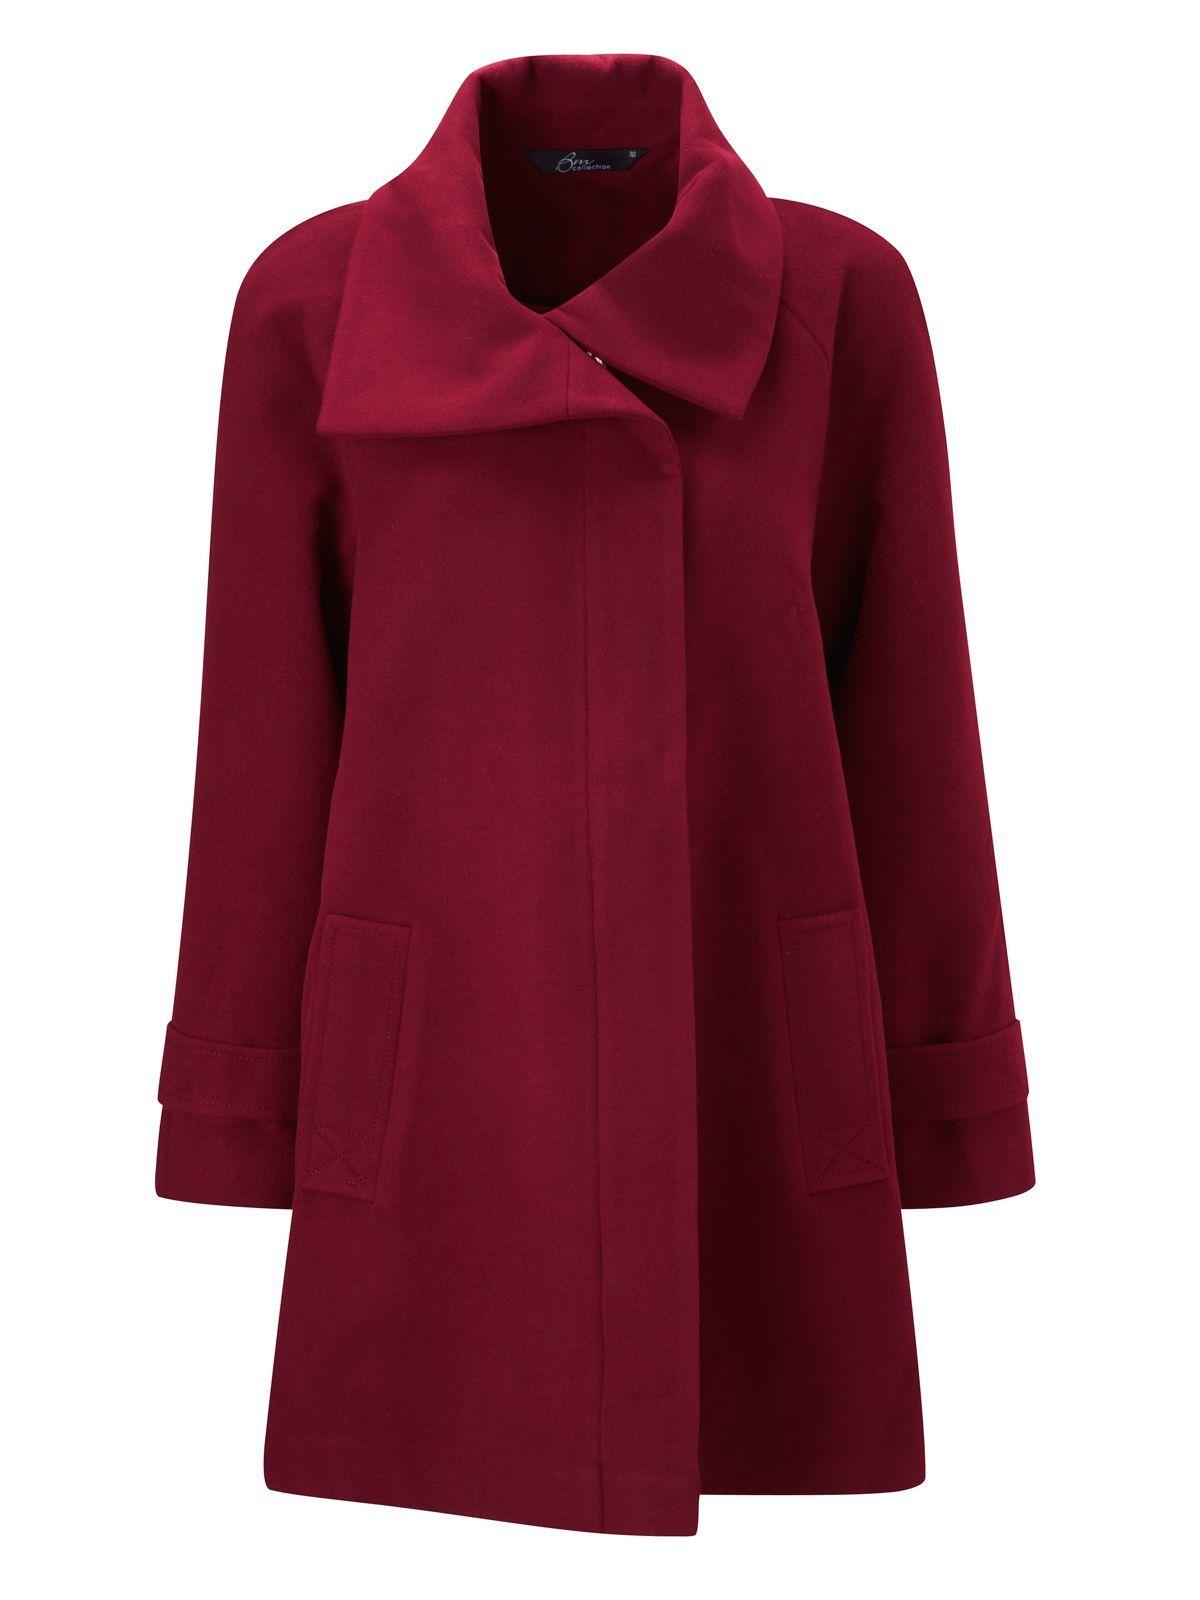 Classic Coats For Plus Size Women At Bonmarche Stylish Curves Plus Size Dress Outfits Designer Plus Size Clothing Ladies Plus Size Dresses [ 1600 x 1200 Pixel ]